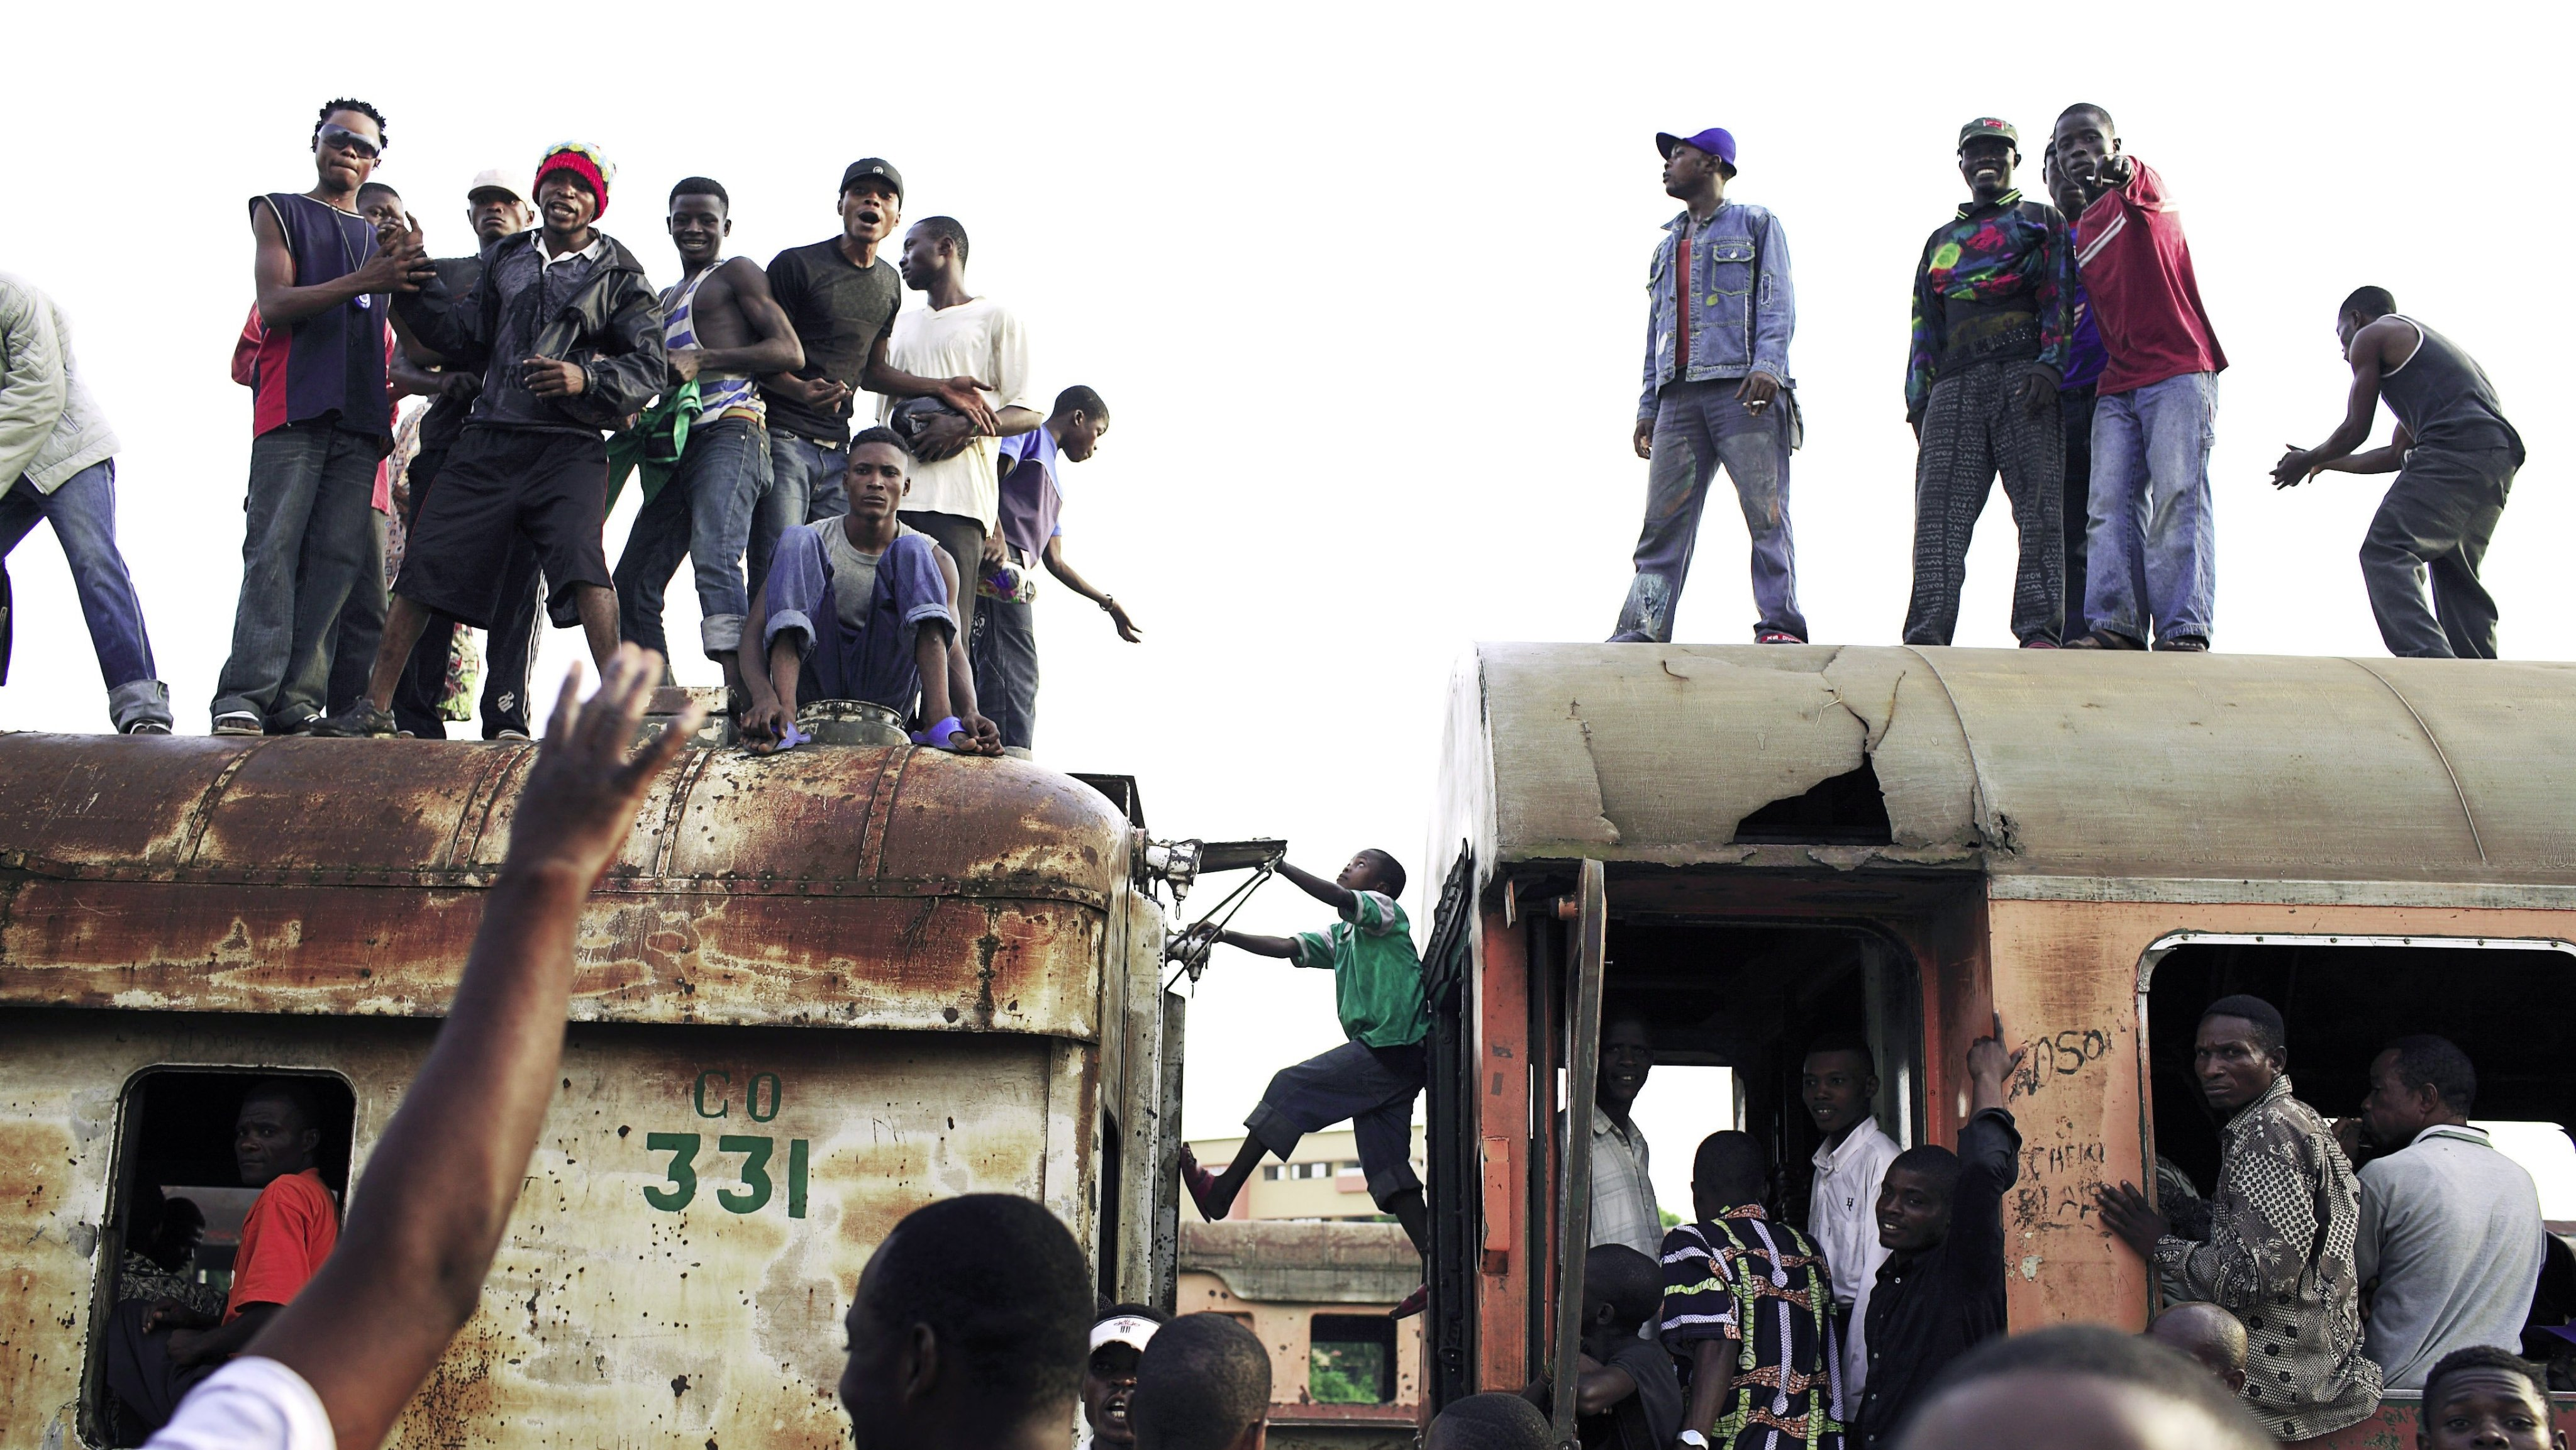 Life in Kinshasa Congo